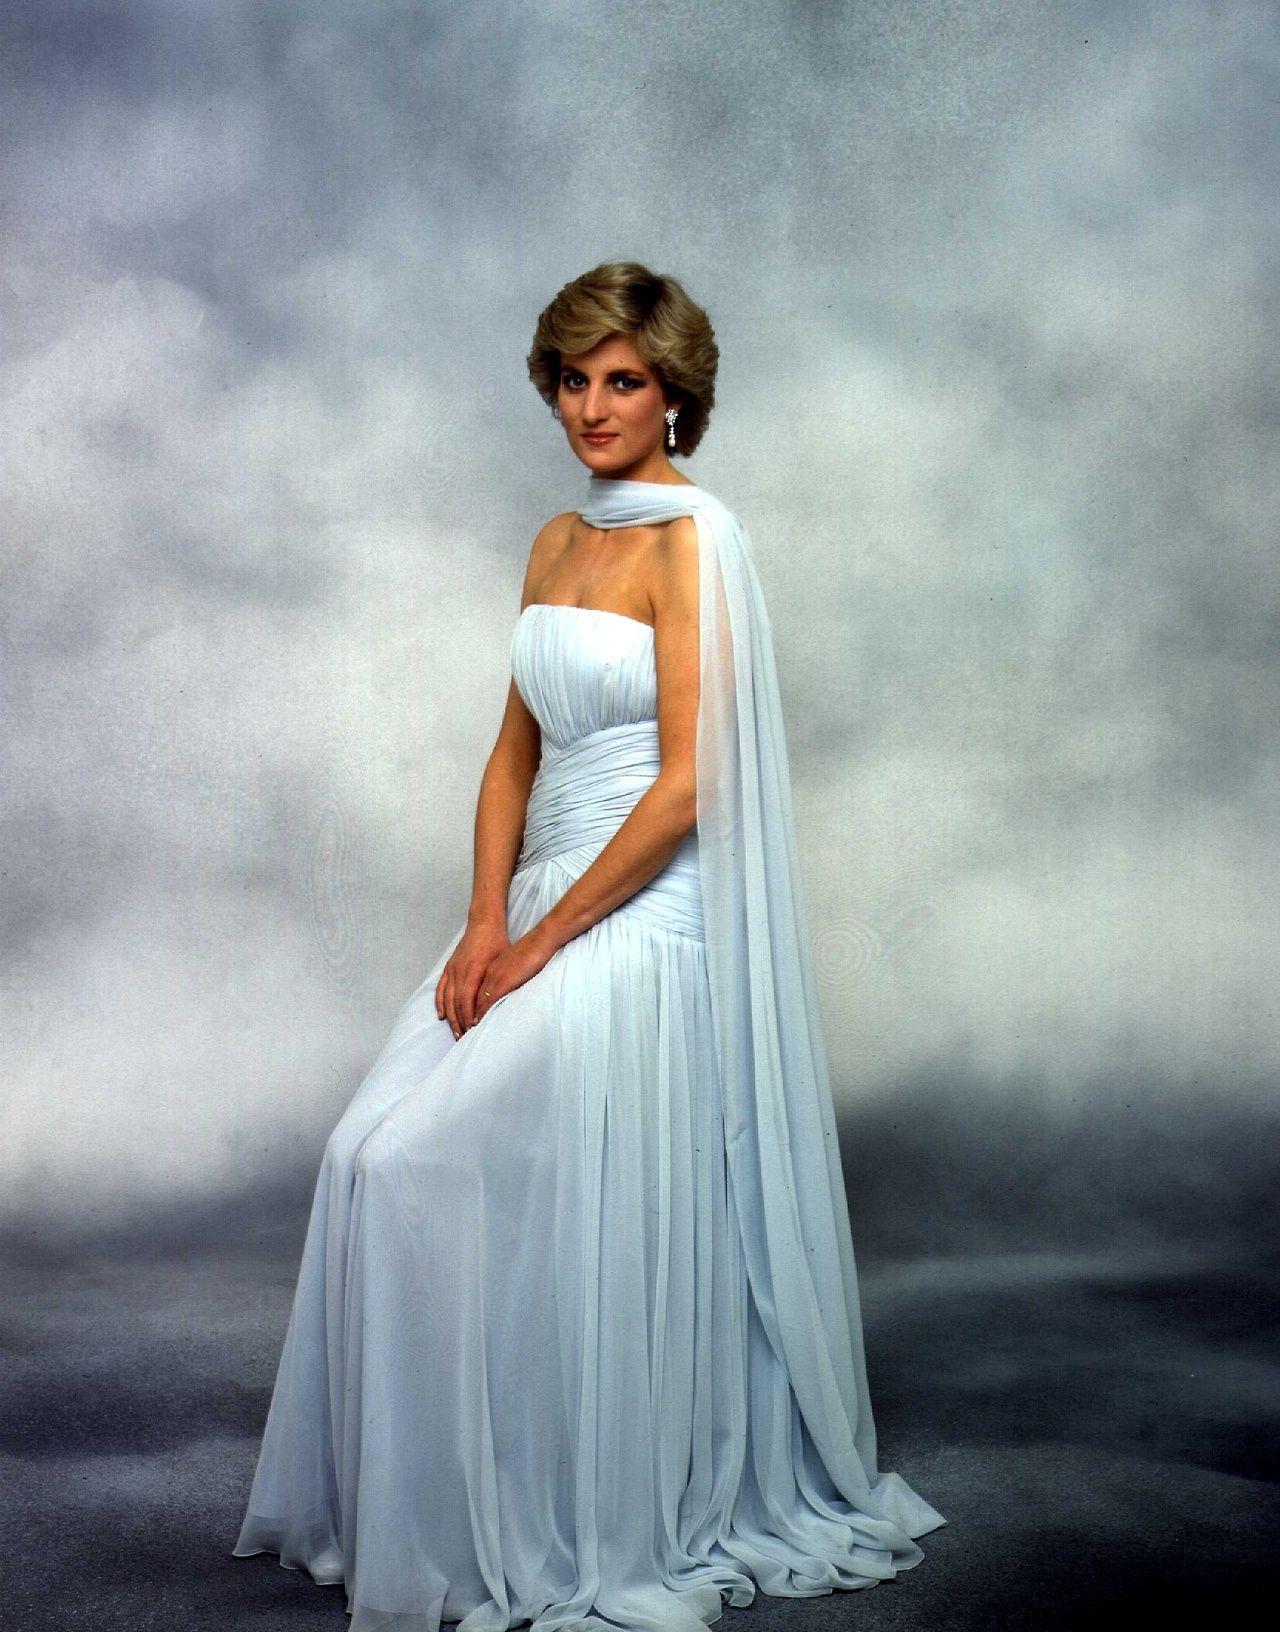 Michelle Horner - Diana #princessdiana